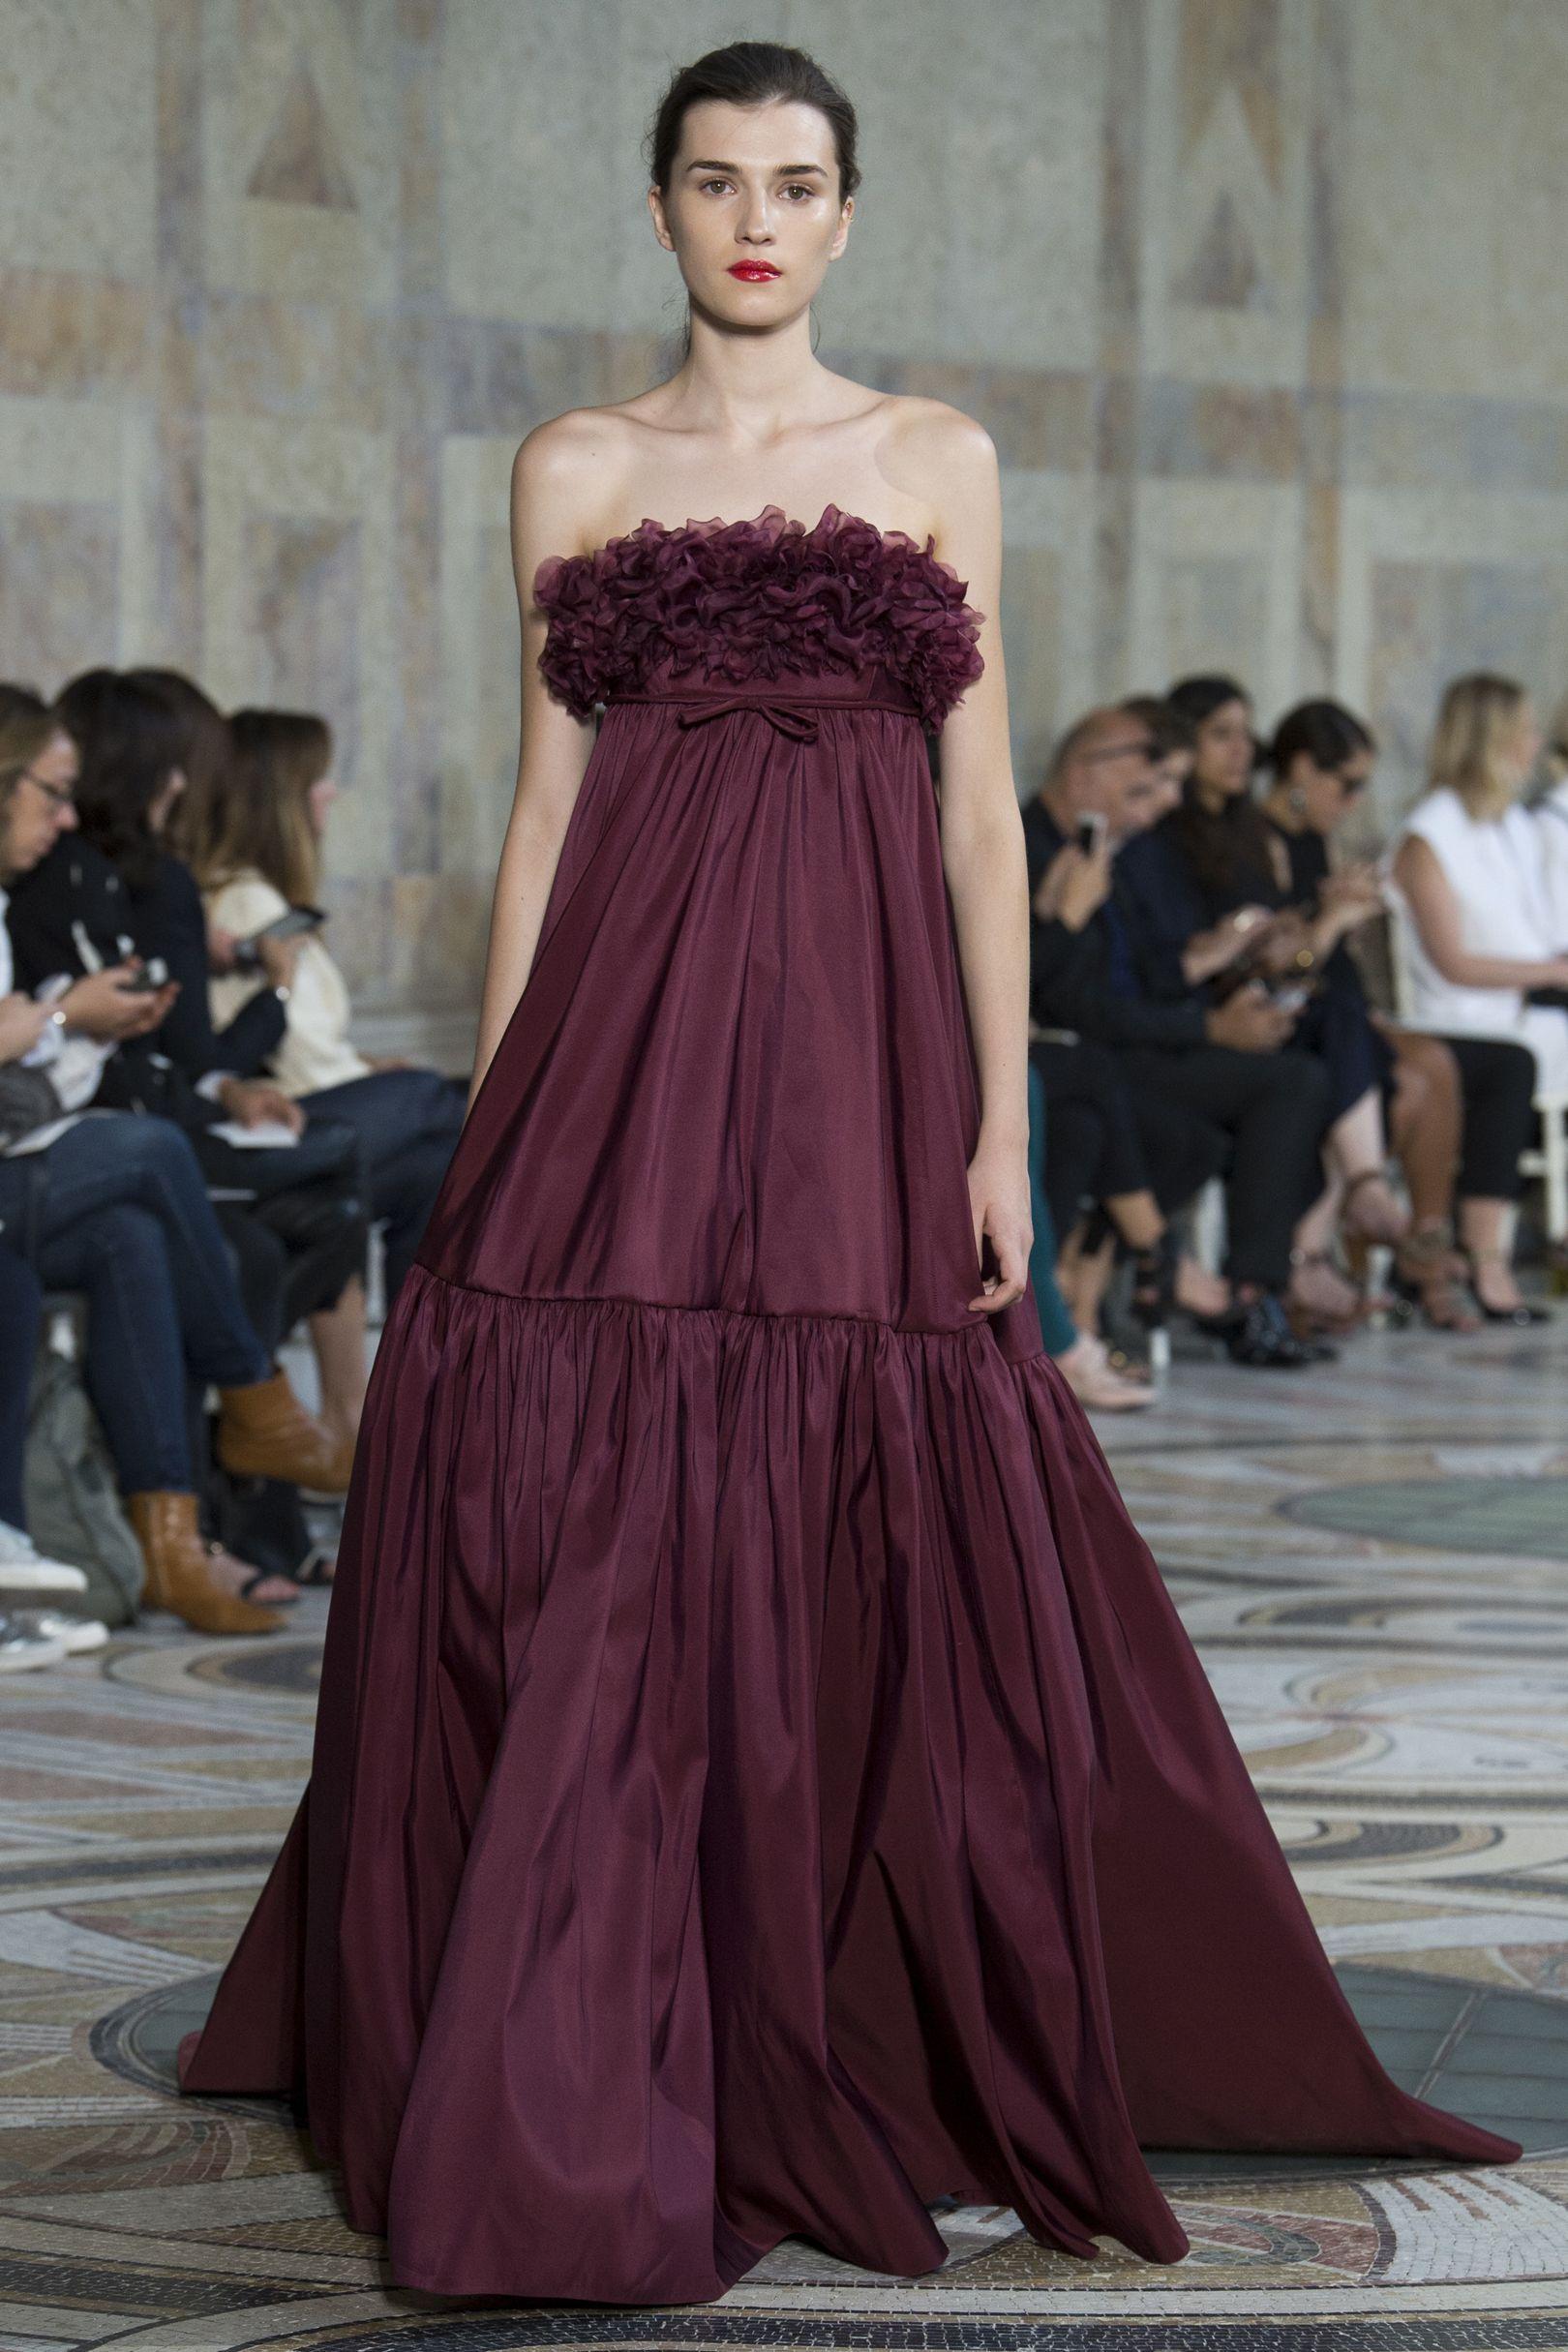 giambattista valli autumn/winter 2017 couture | style defined | moda